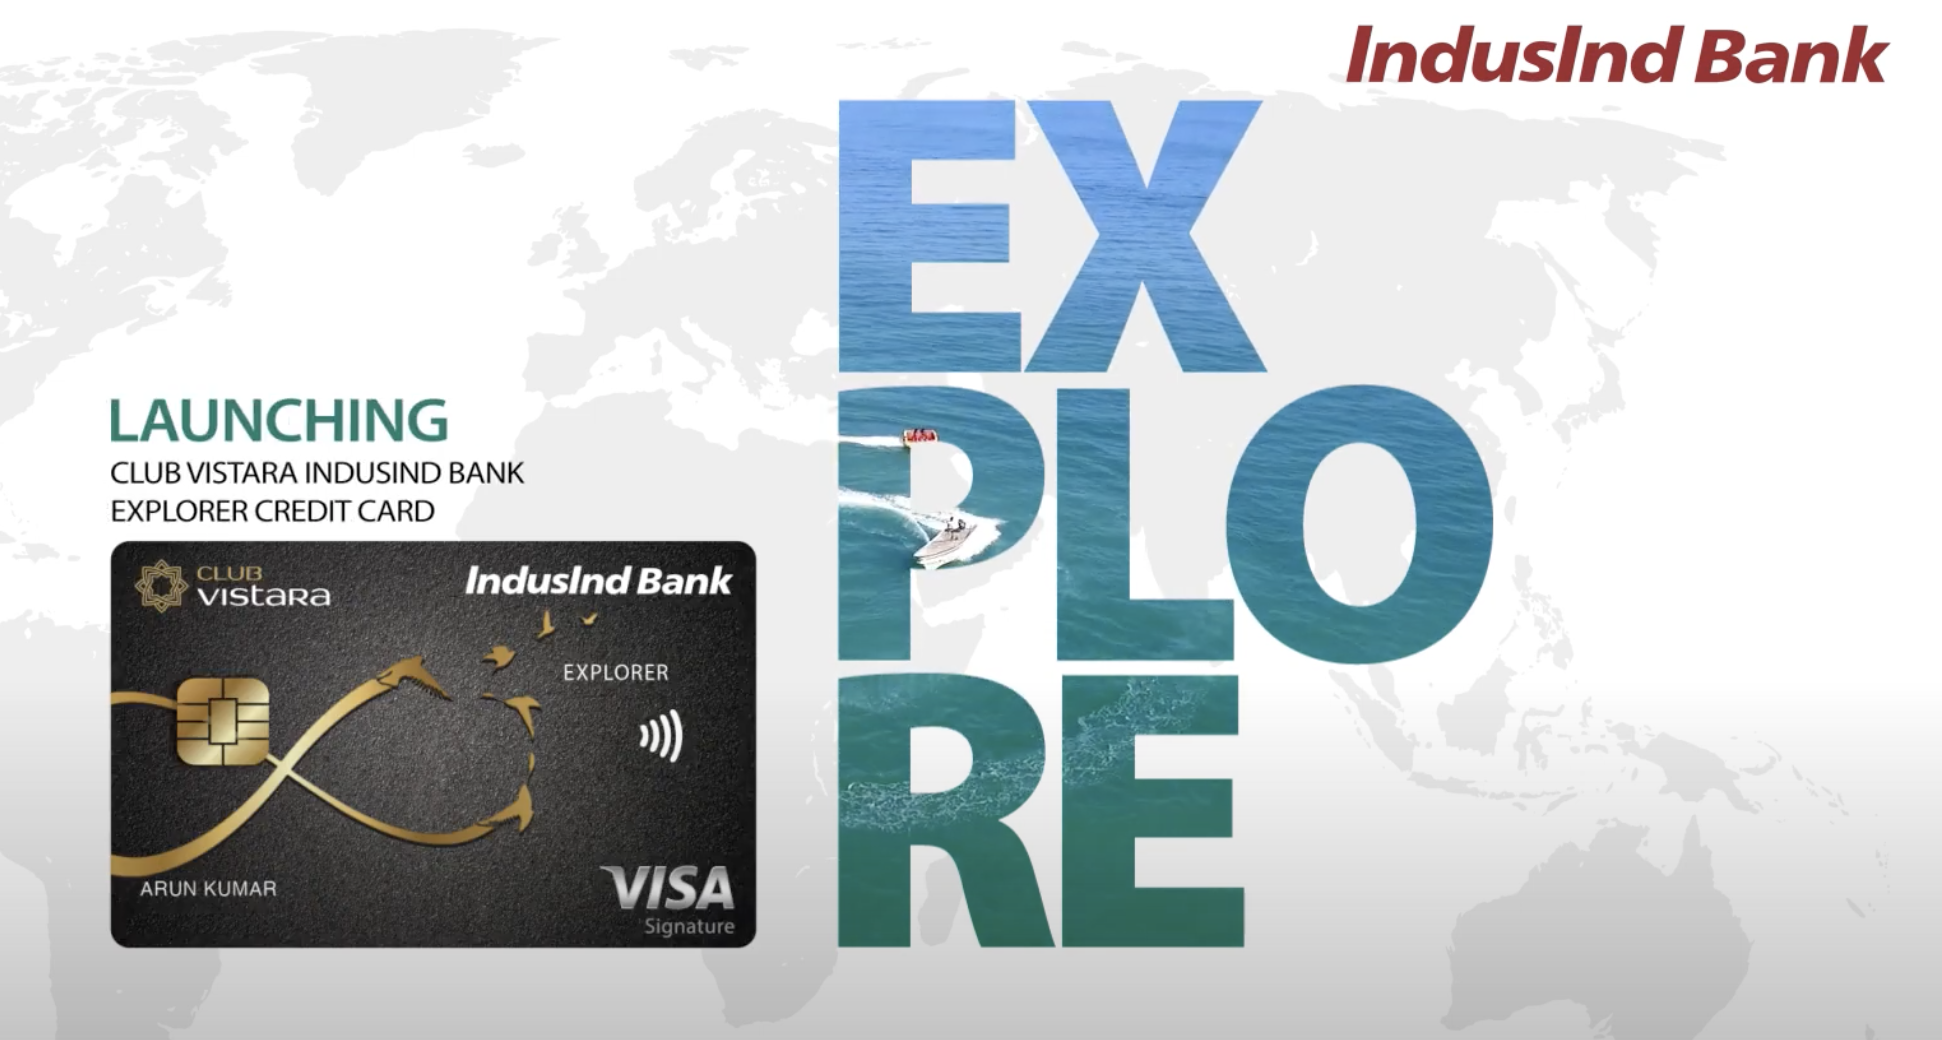 Club Vistara IndusInd Bank Explorer Credit Card